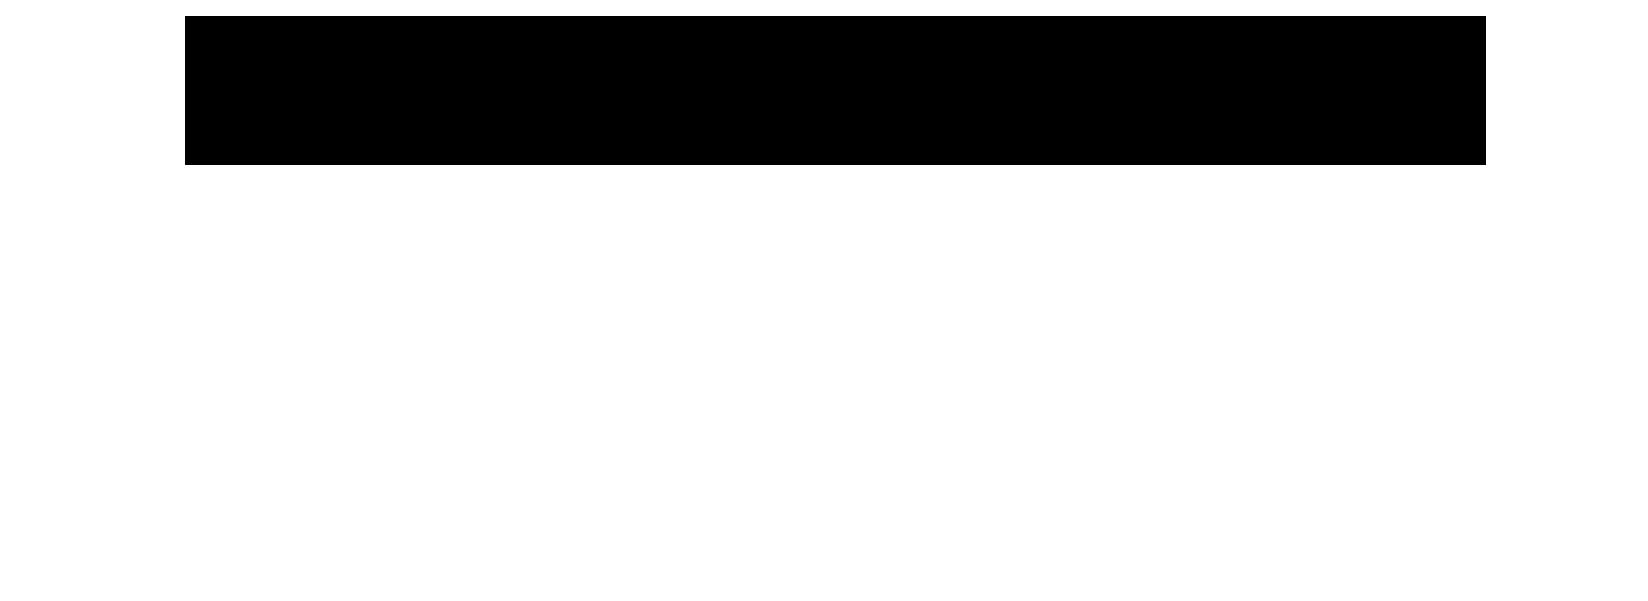 olymphades-logoschwarz3